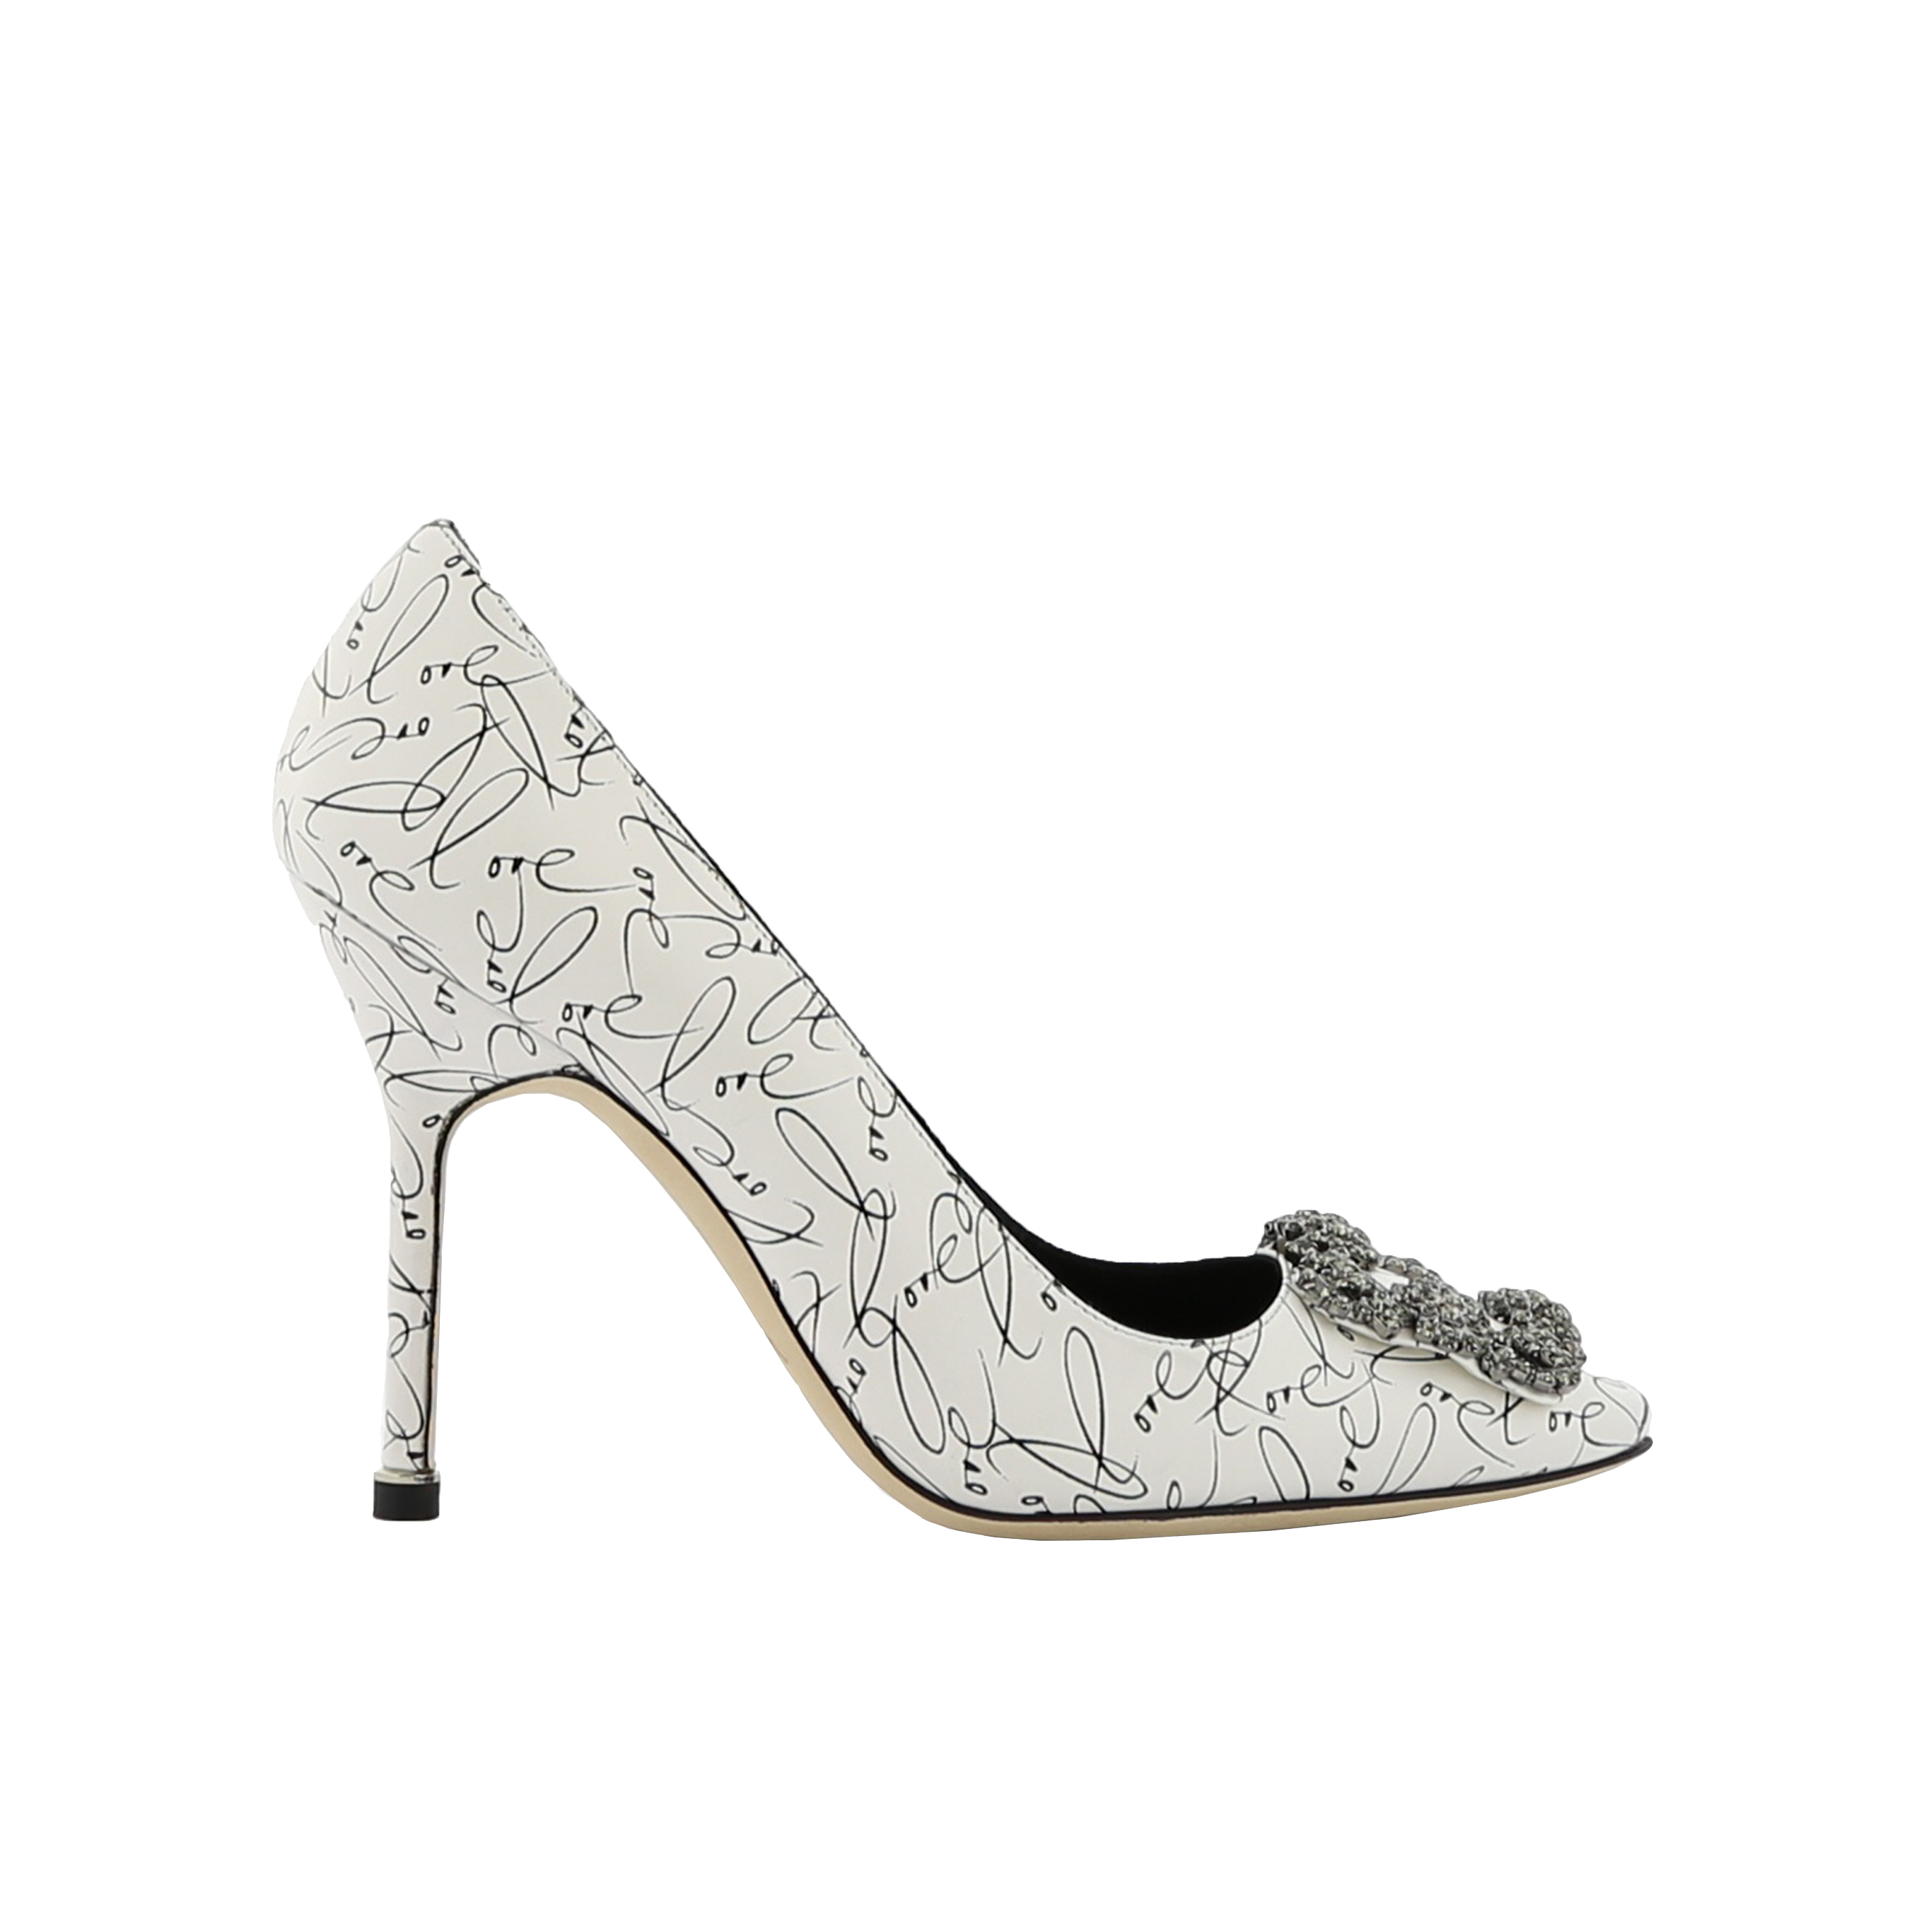 White Calf Leather Love Print Jewel Buckle Pumps